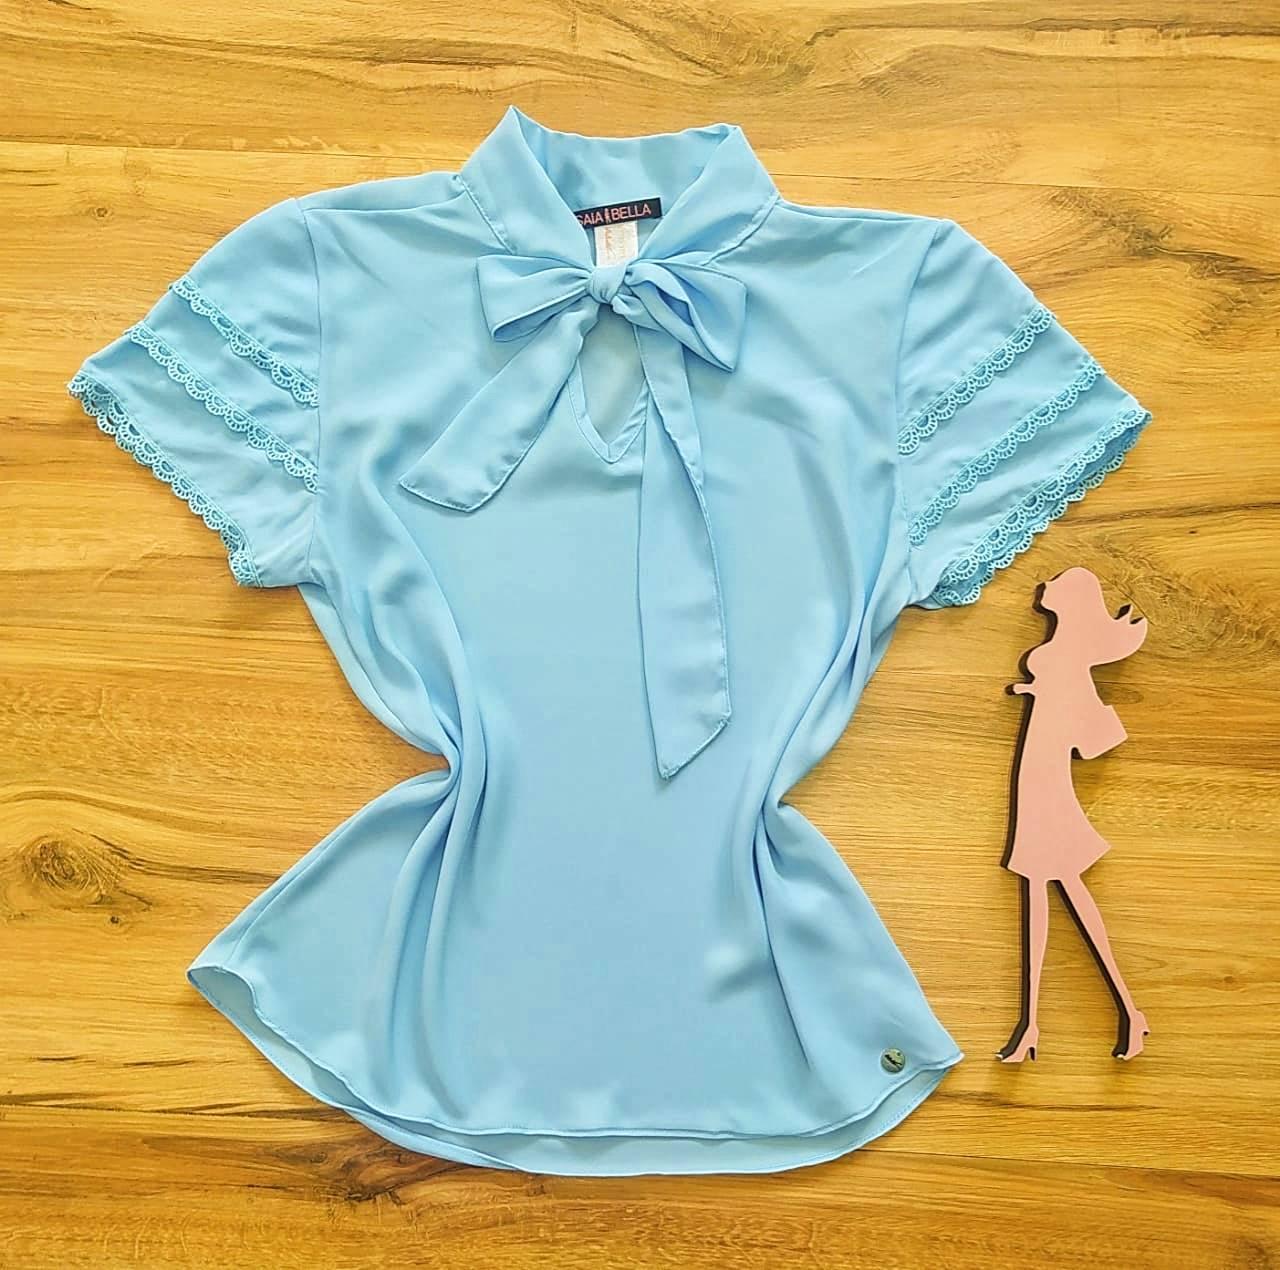 Blusa de Renda Mell Saia Bella - SB9976 azul bebê